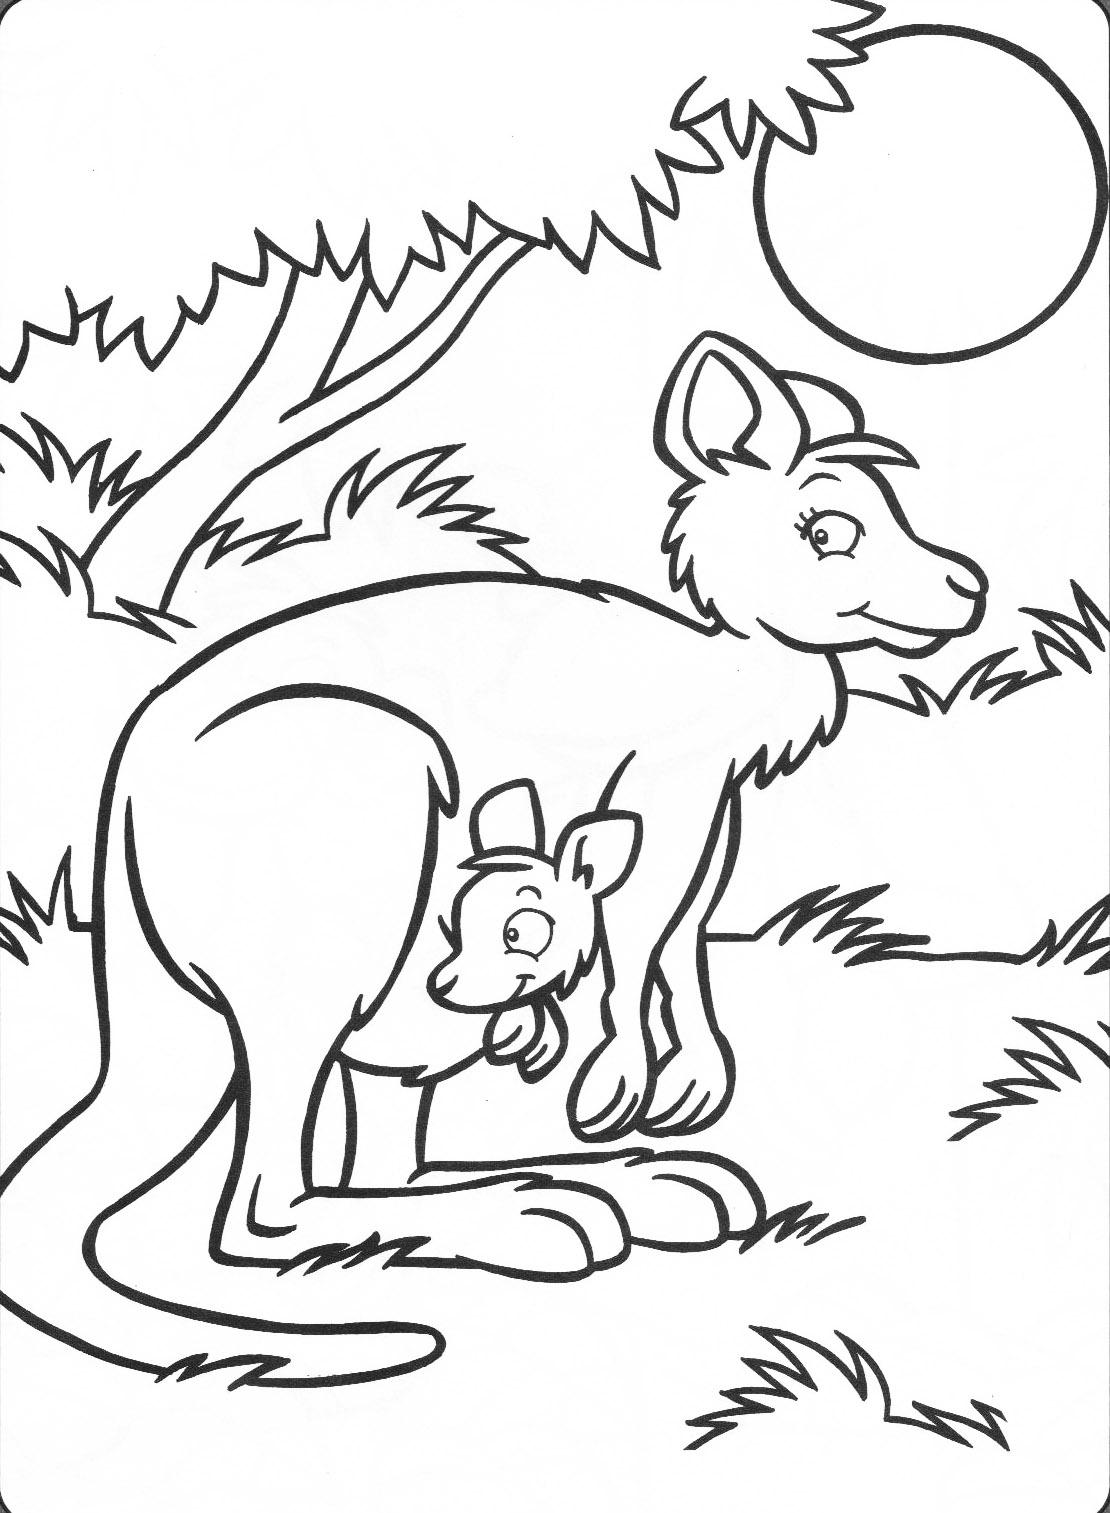 Kangaroo - Animal Coloring pages for kids to print & color